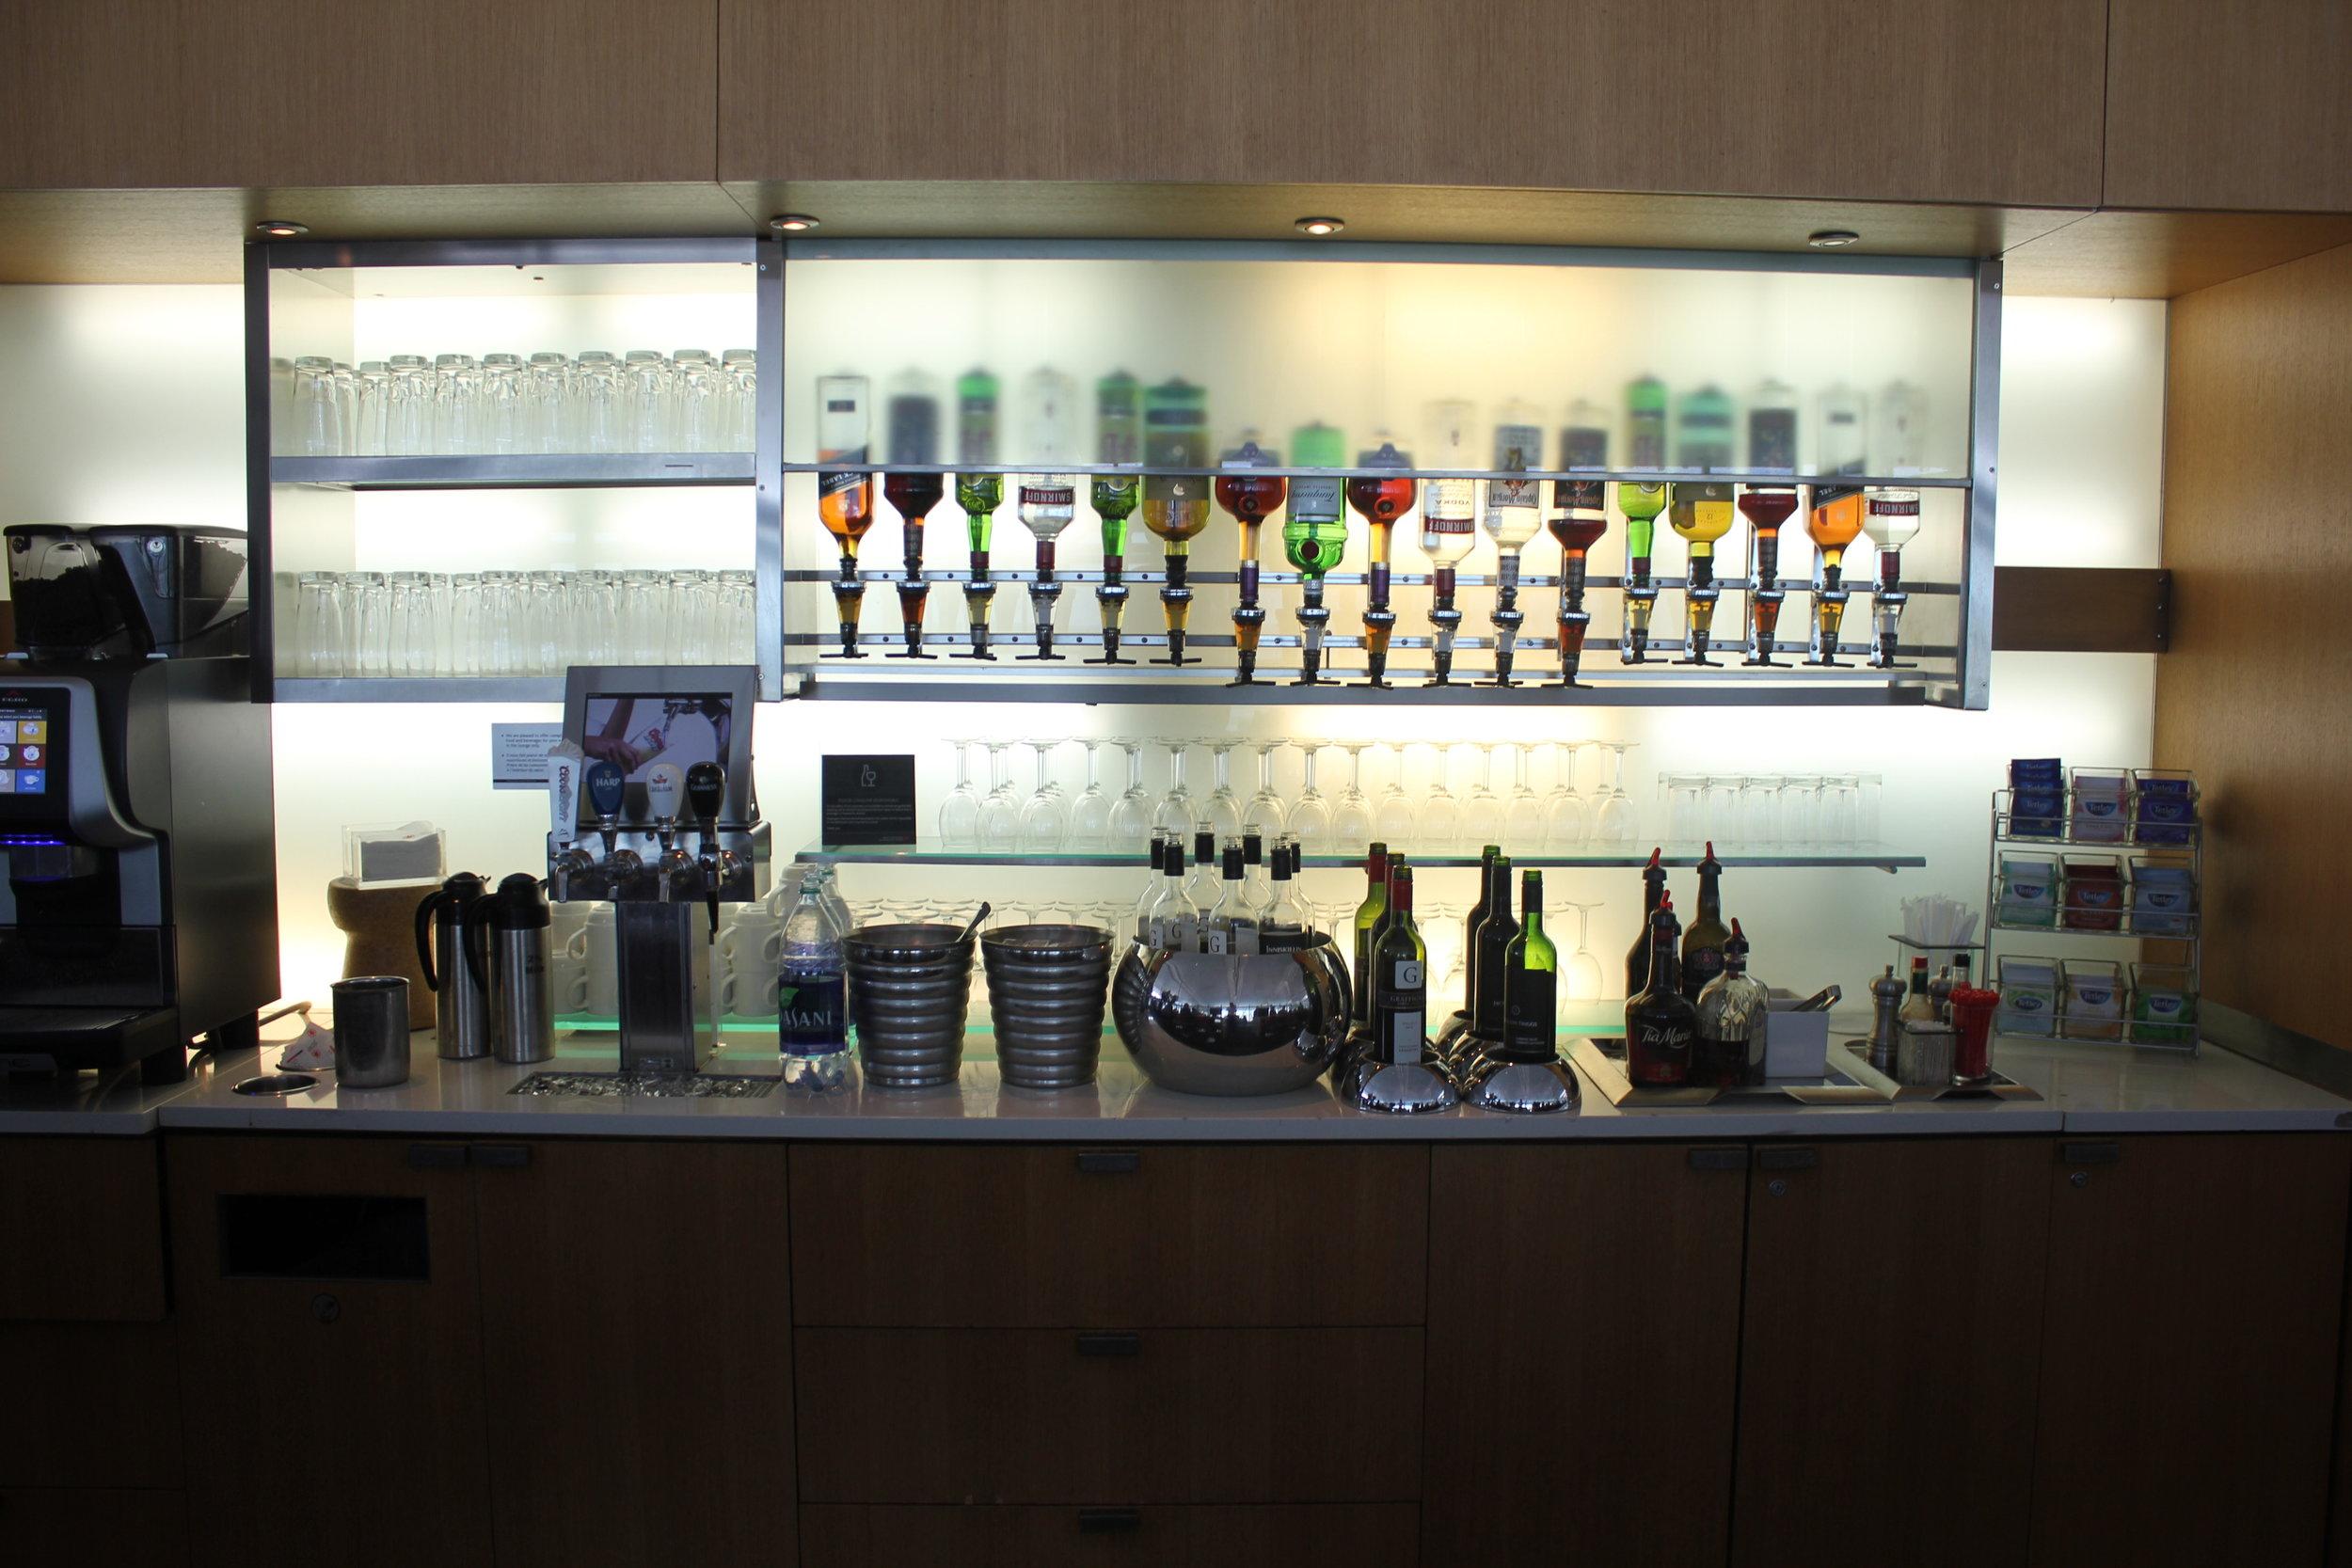 Air Canada Maple Leaf Lounge Toronto (International) – Liquor selection